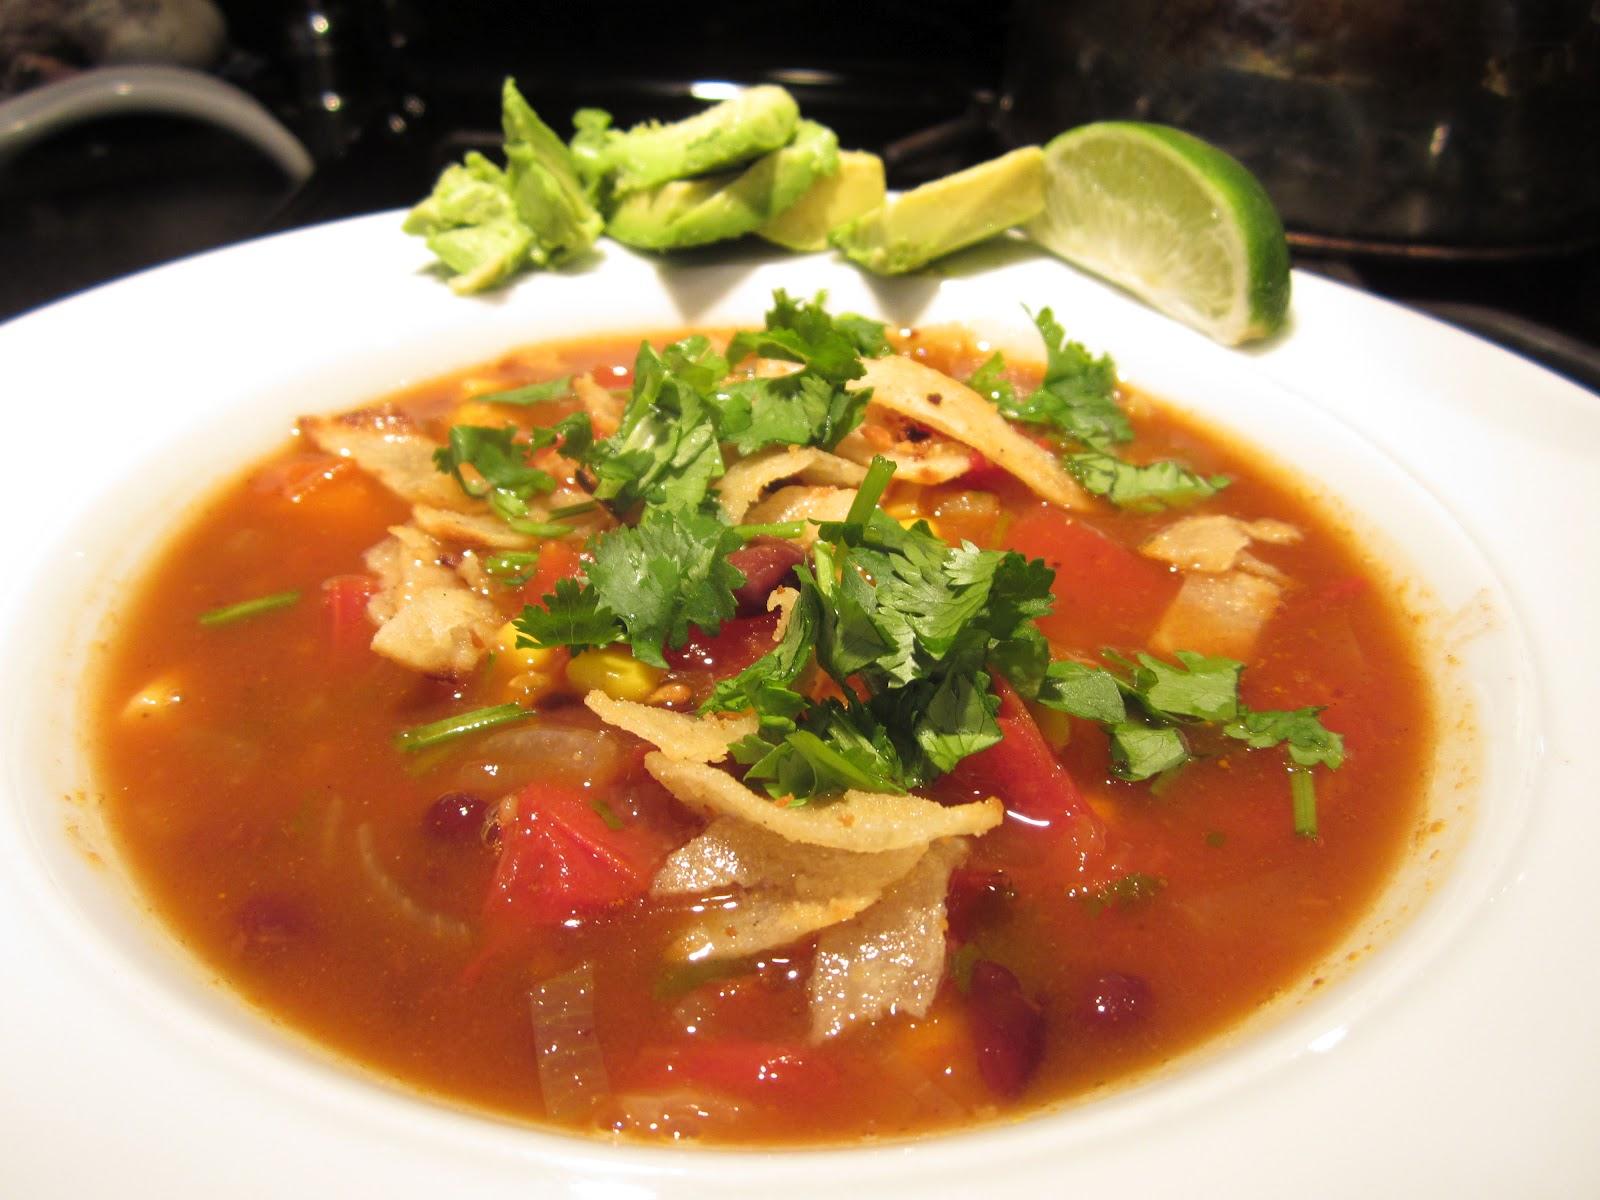 soup tortilla soup tortilla soup tortilla soup tortilla soup tortilla ...